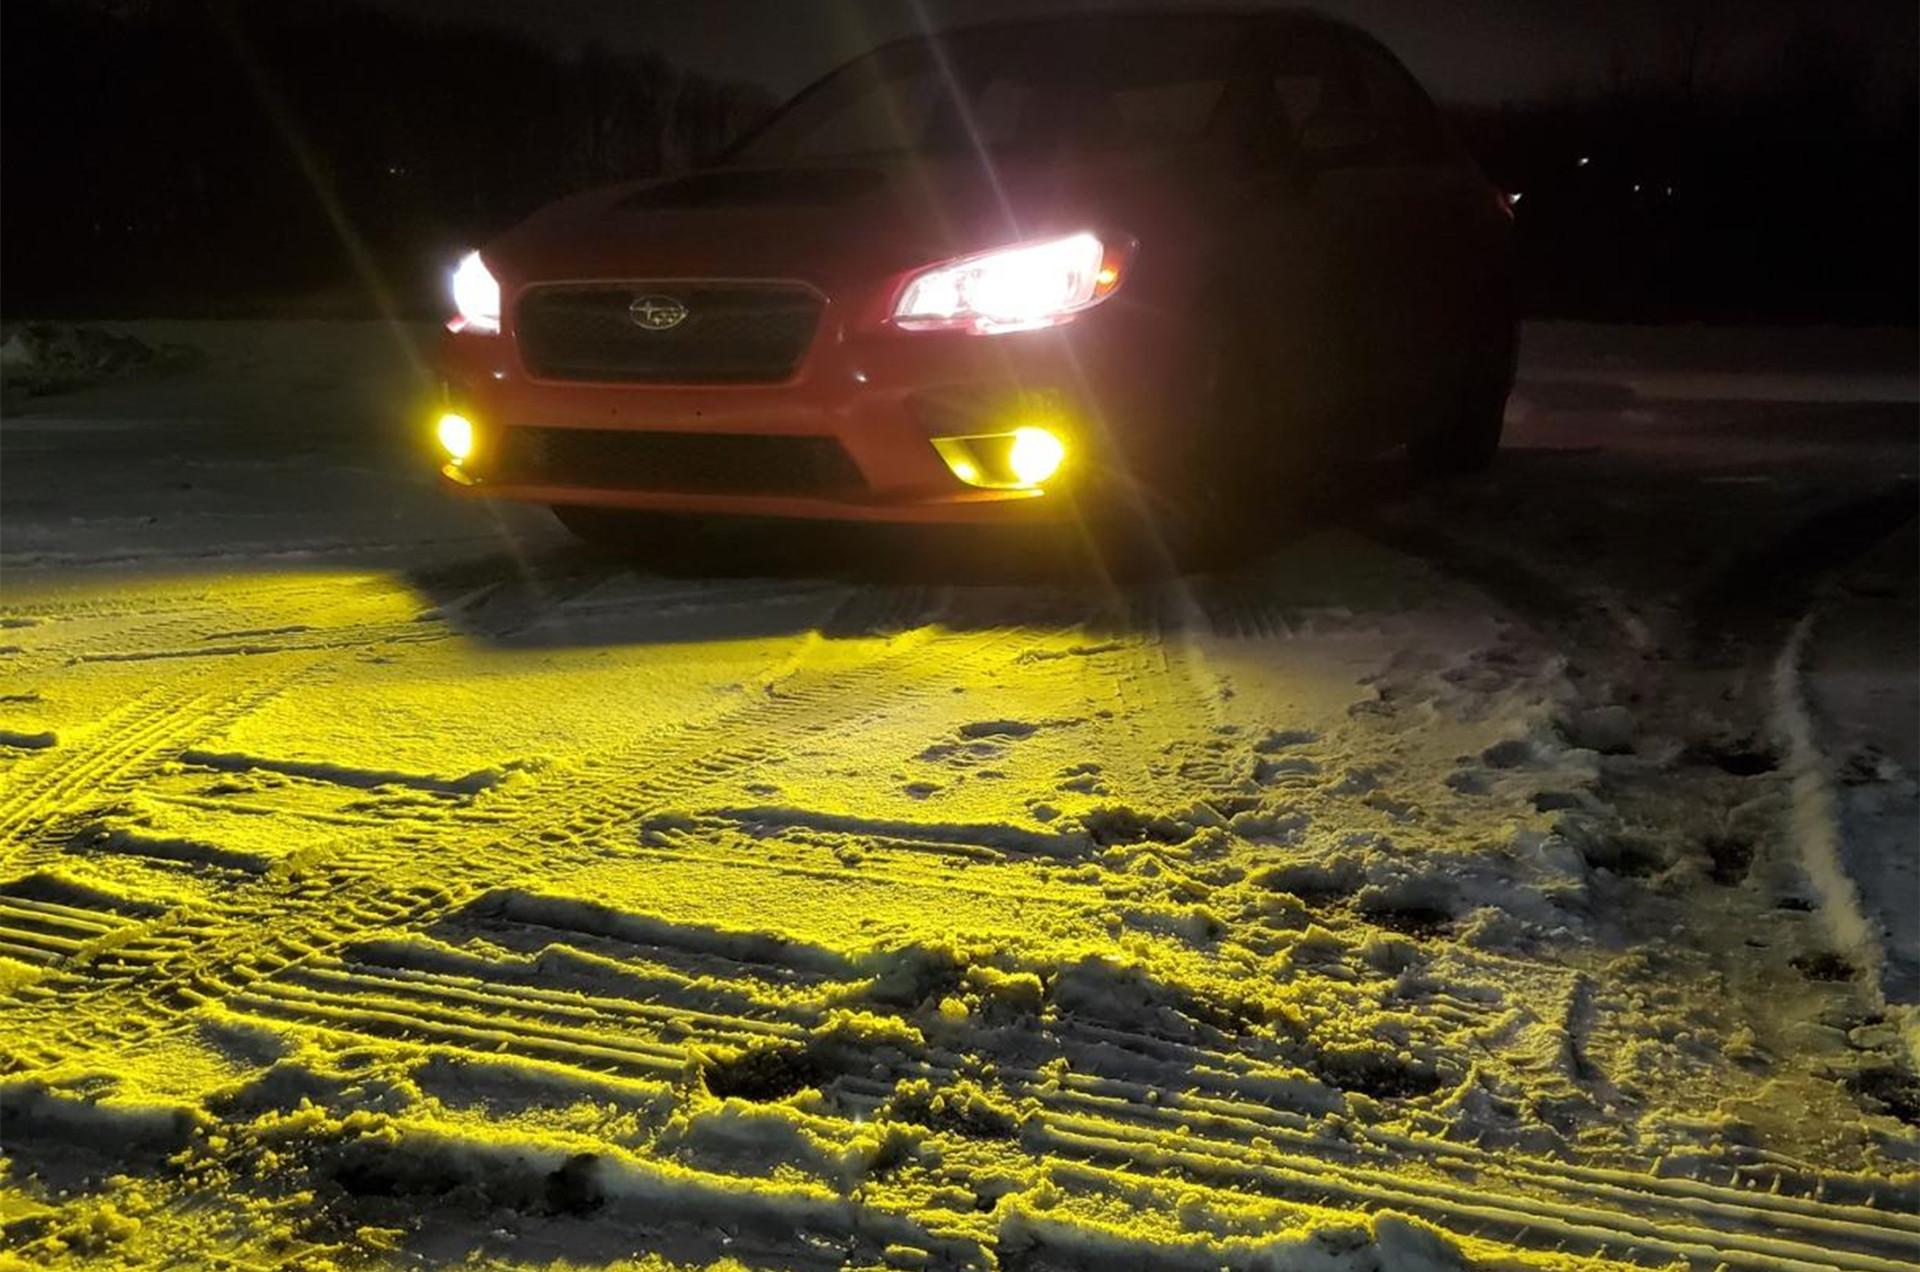 Subaru-crosstrek-headlights-fog-lights-bulbs-white-yellow-H11-Upgrade